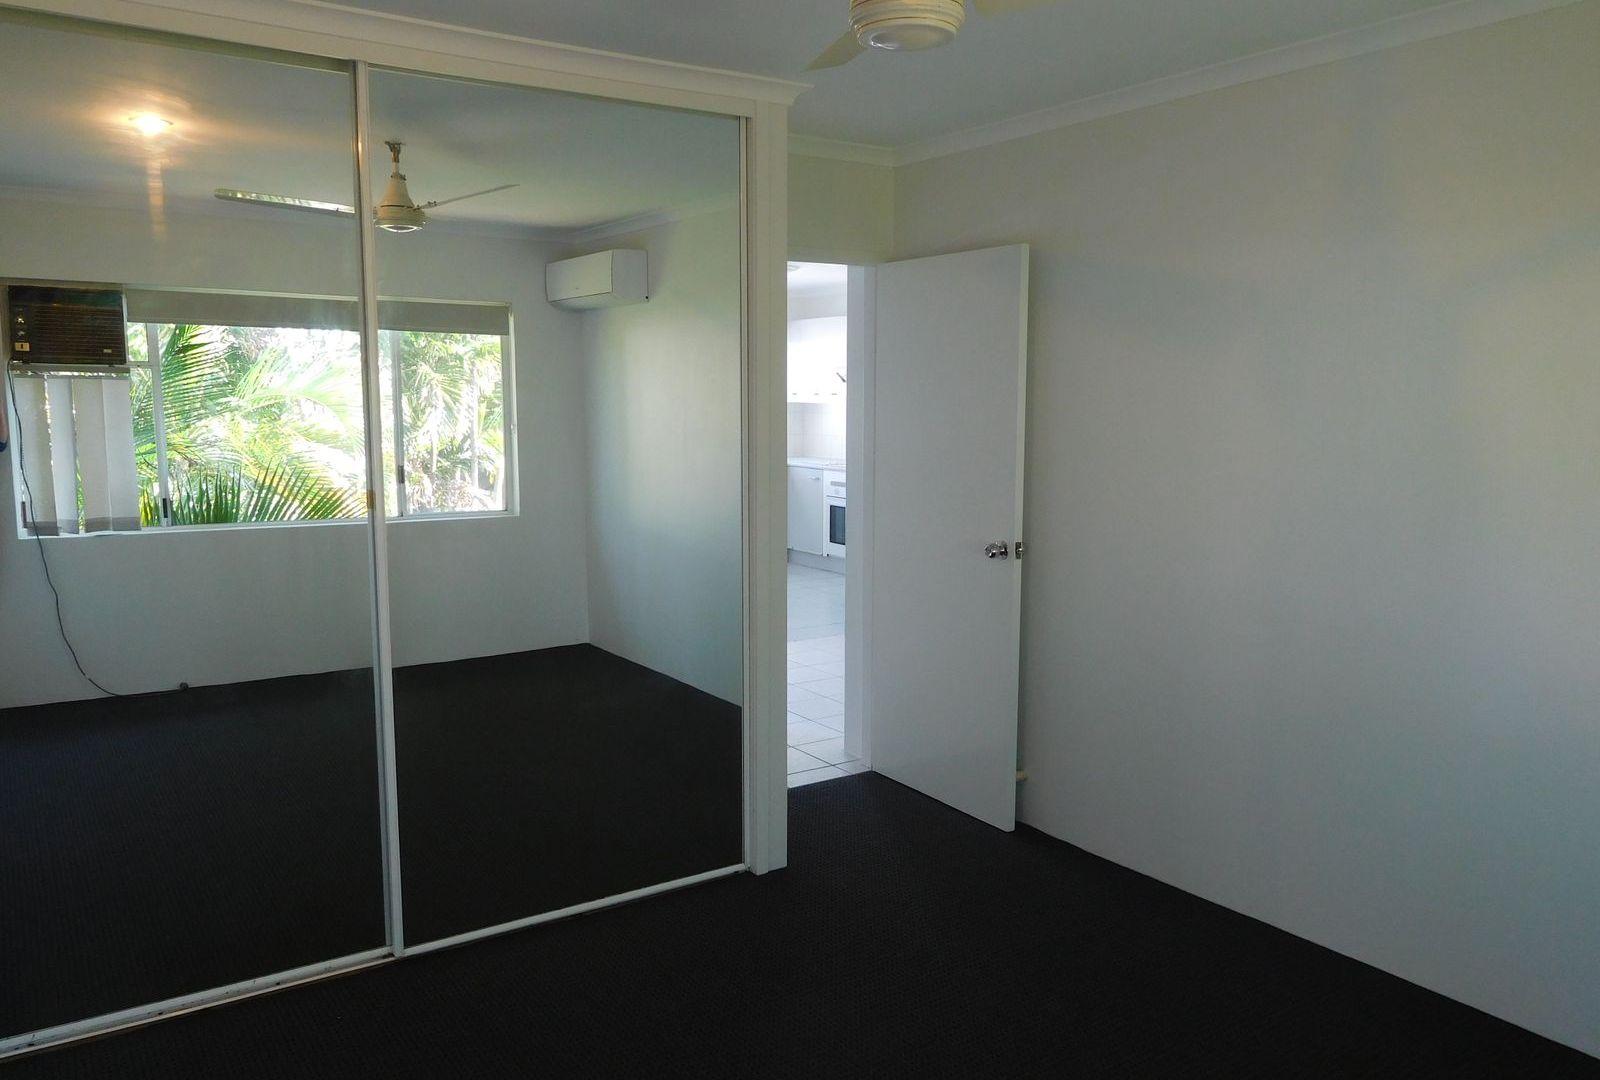 10/314 Draper Street, Parramatta Park QLD 4870, Image 2